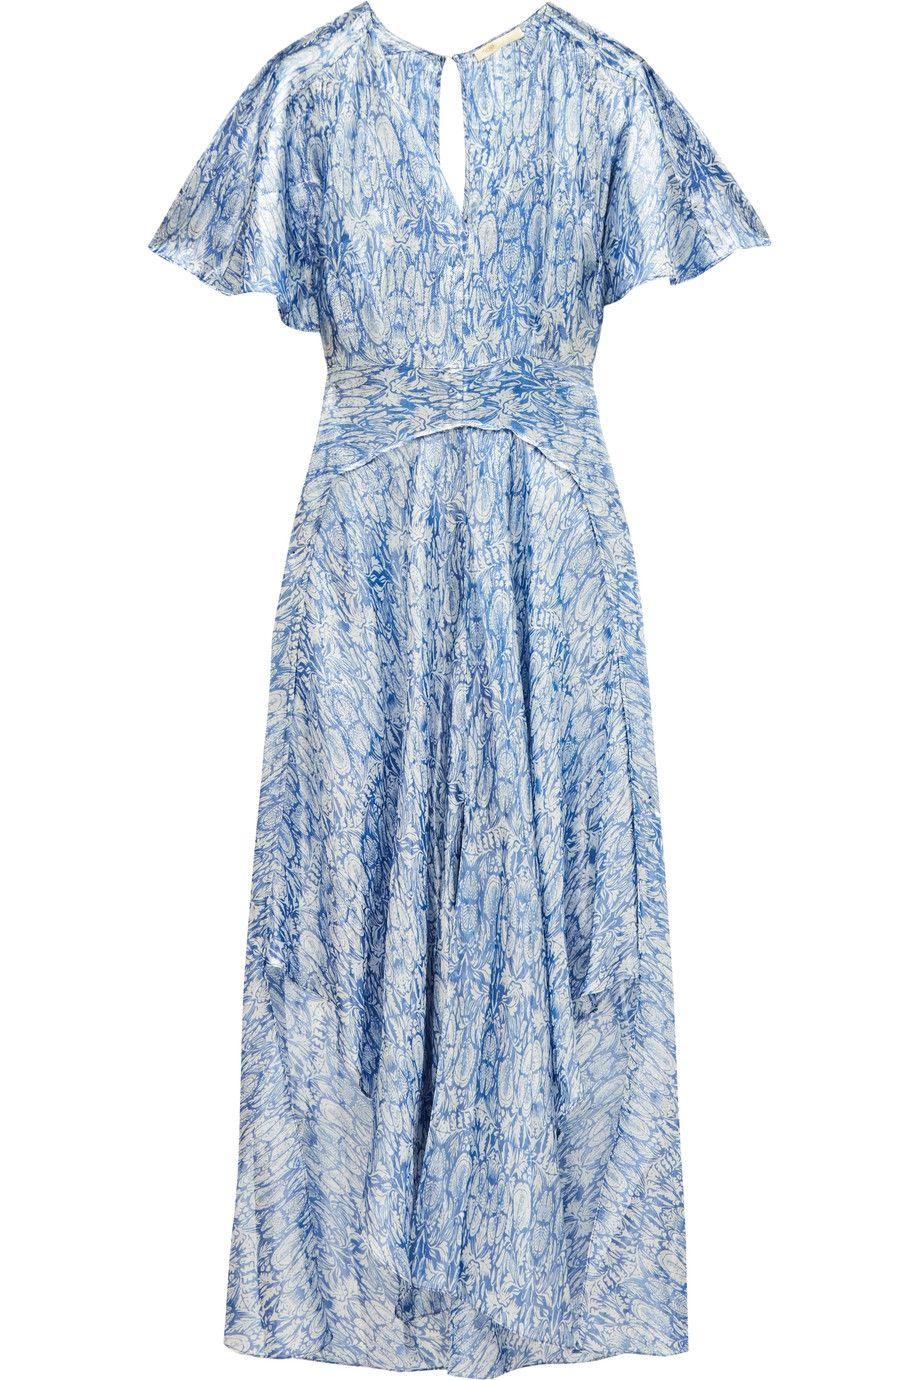 Maje Metallic Printed Dress